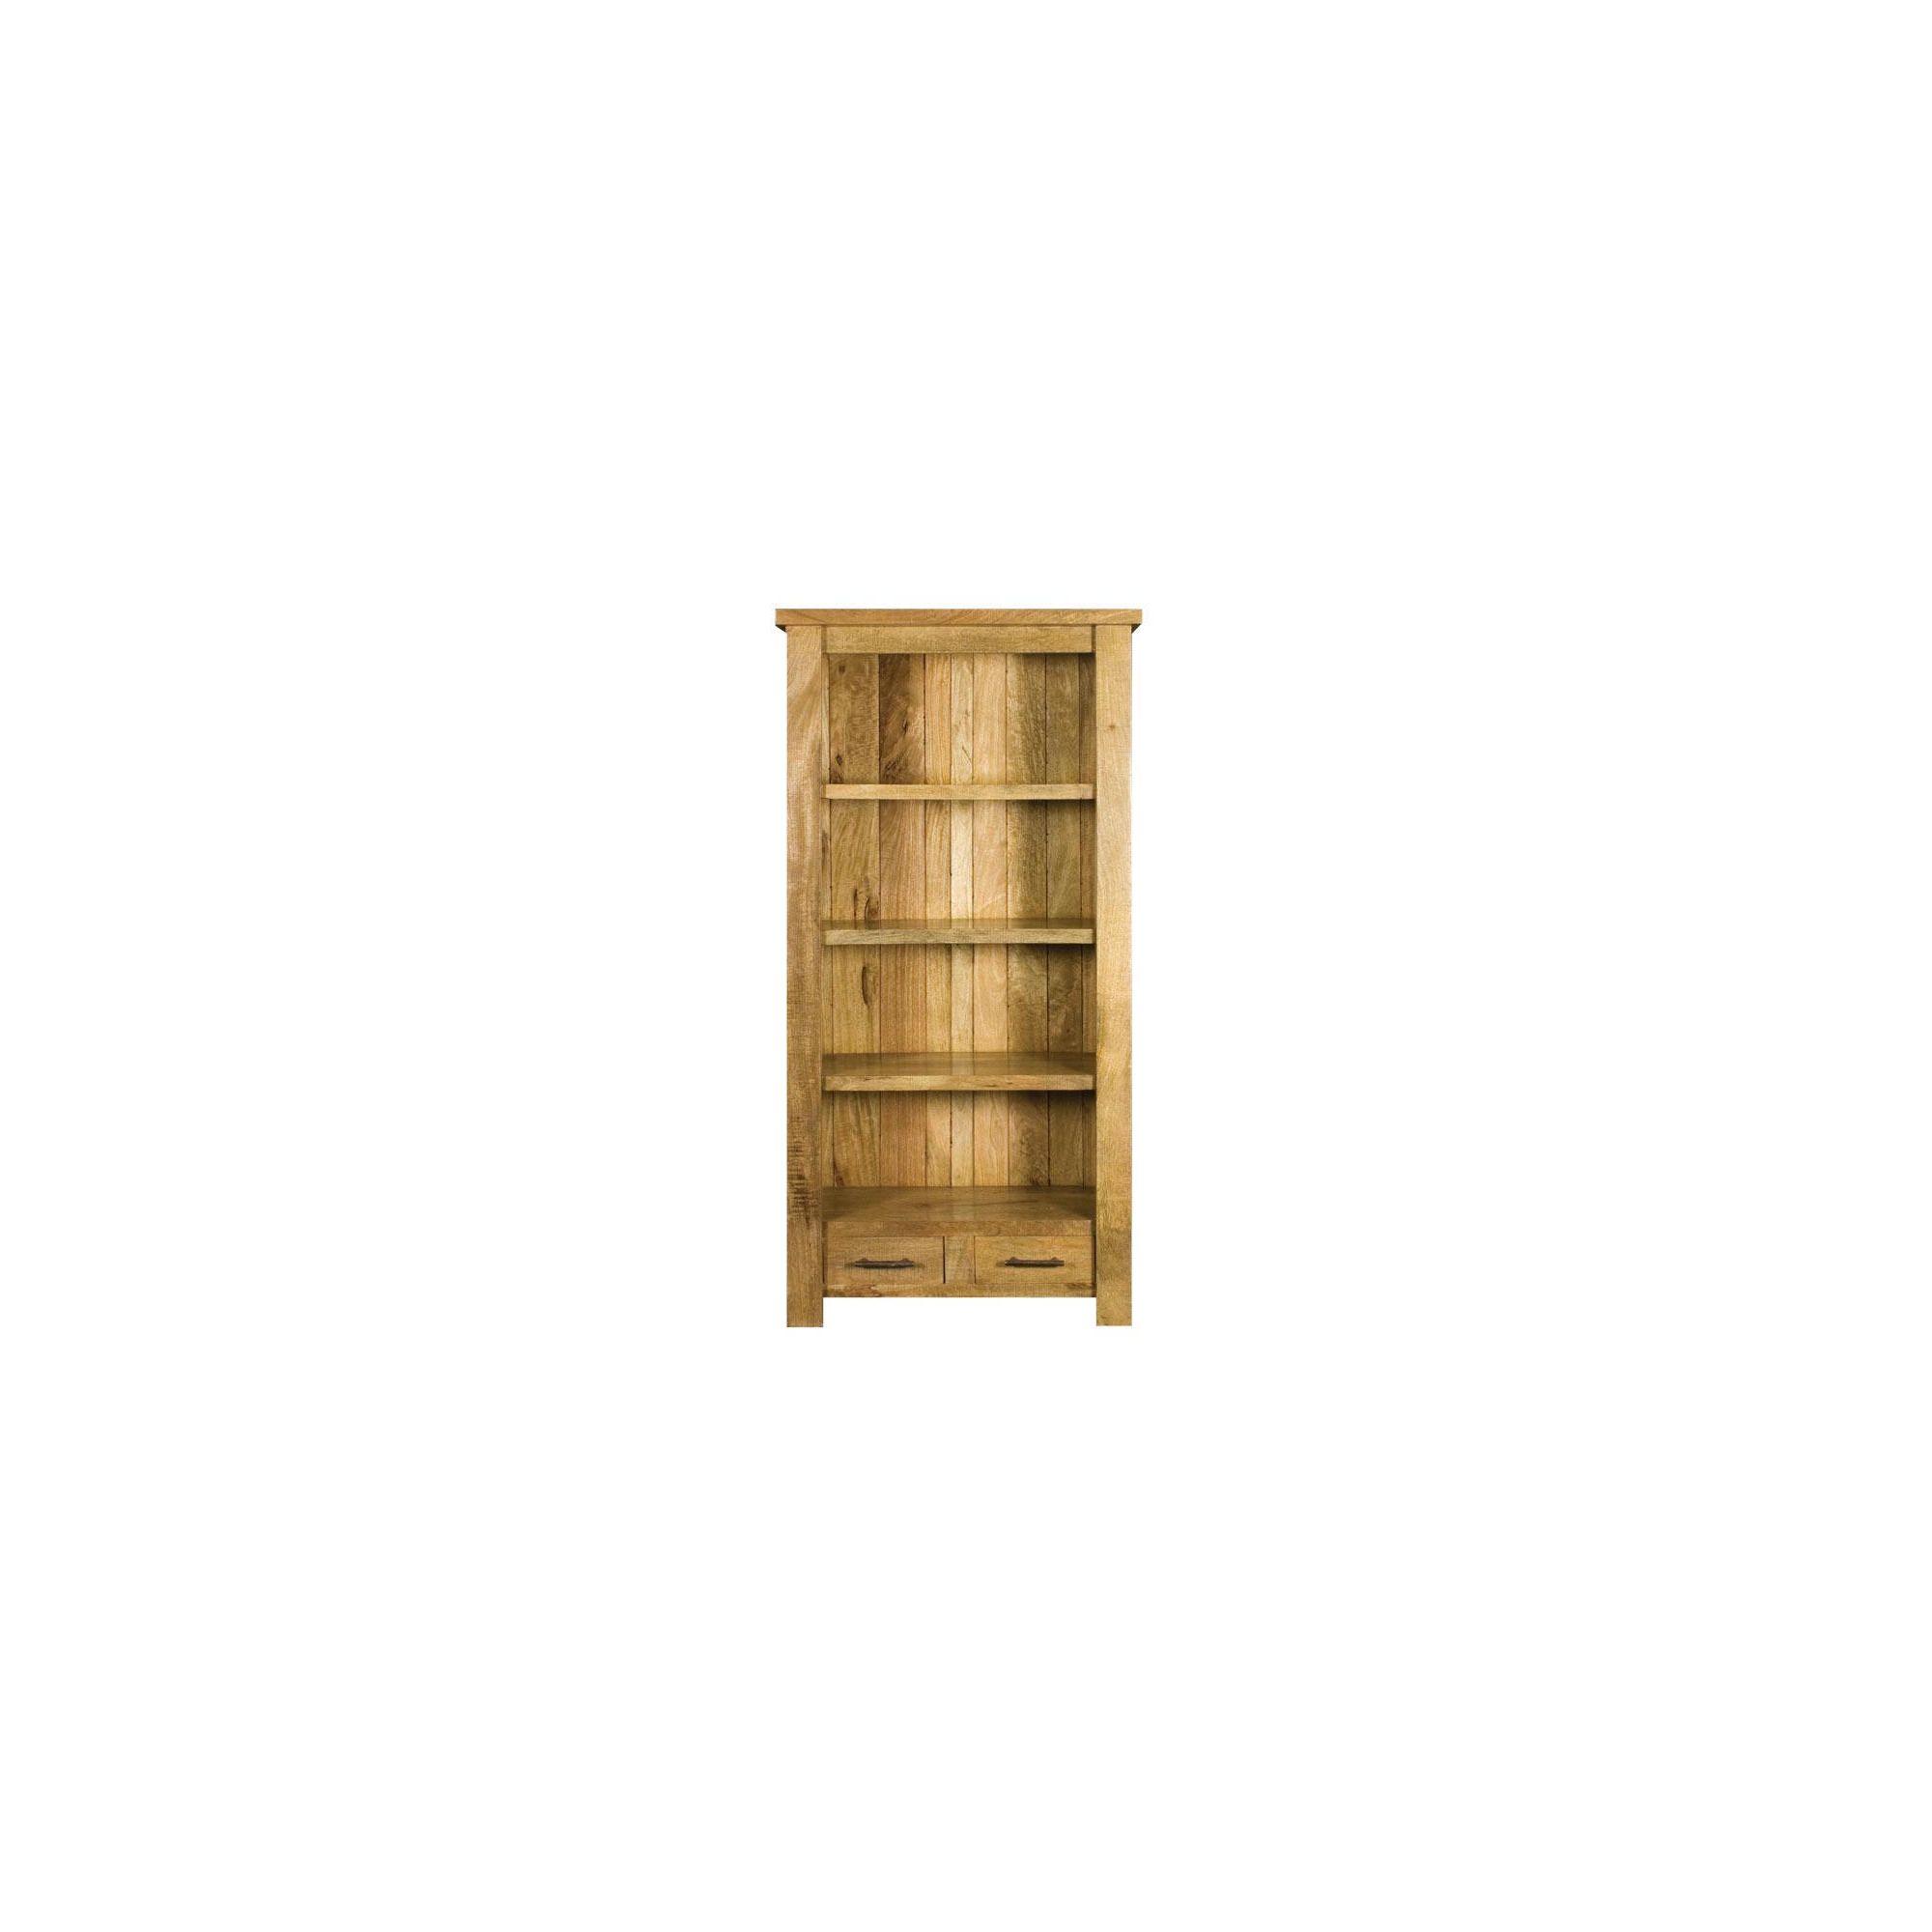 Alterton Furniture Rutland Tall Bookcase at Tesco Direct